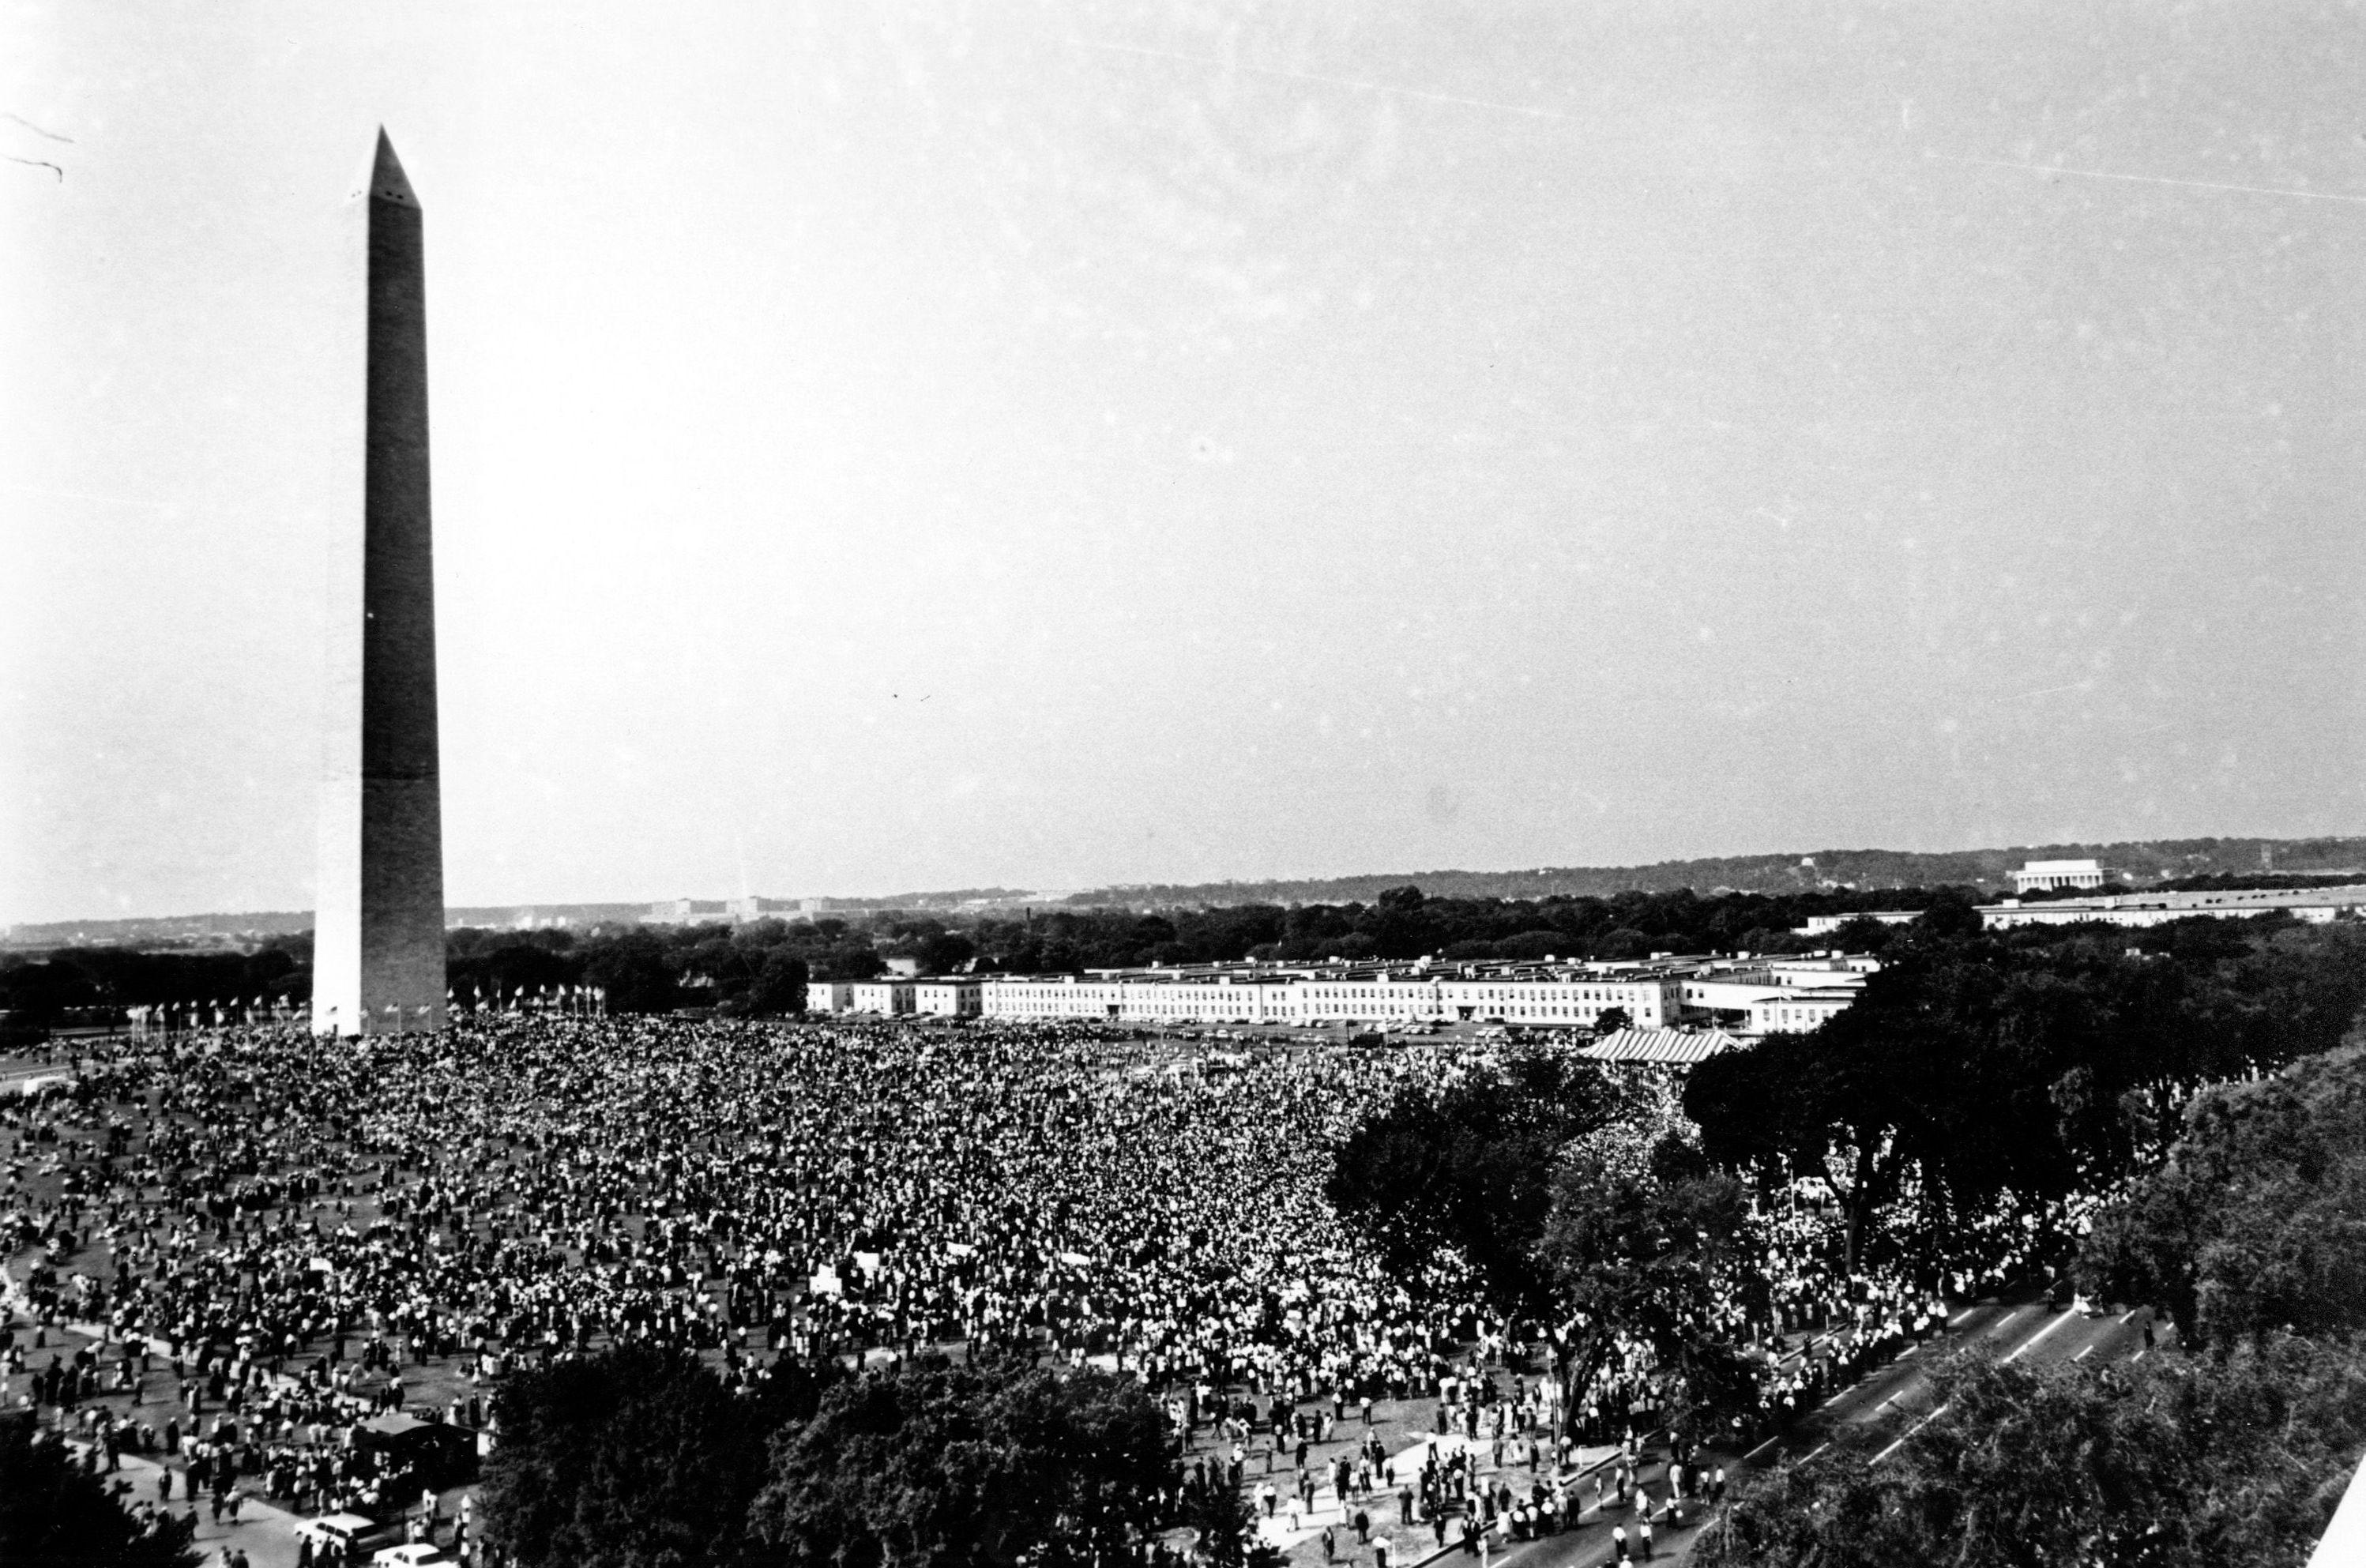 Марш на Вашингтон за рабочие места и свободу, 28 августа 1963 года